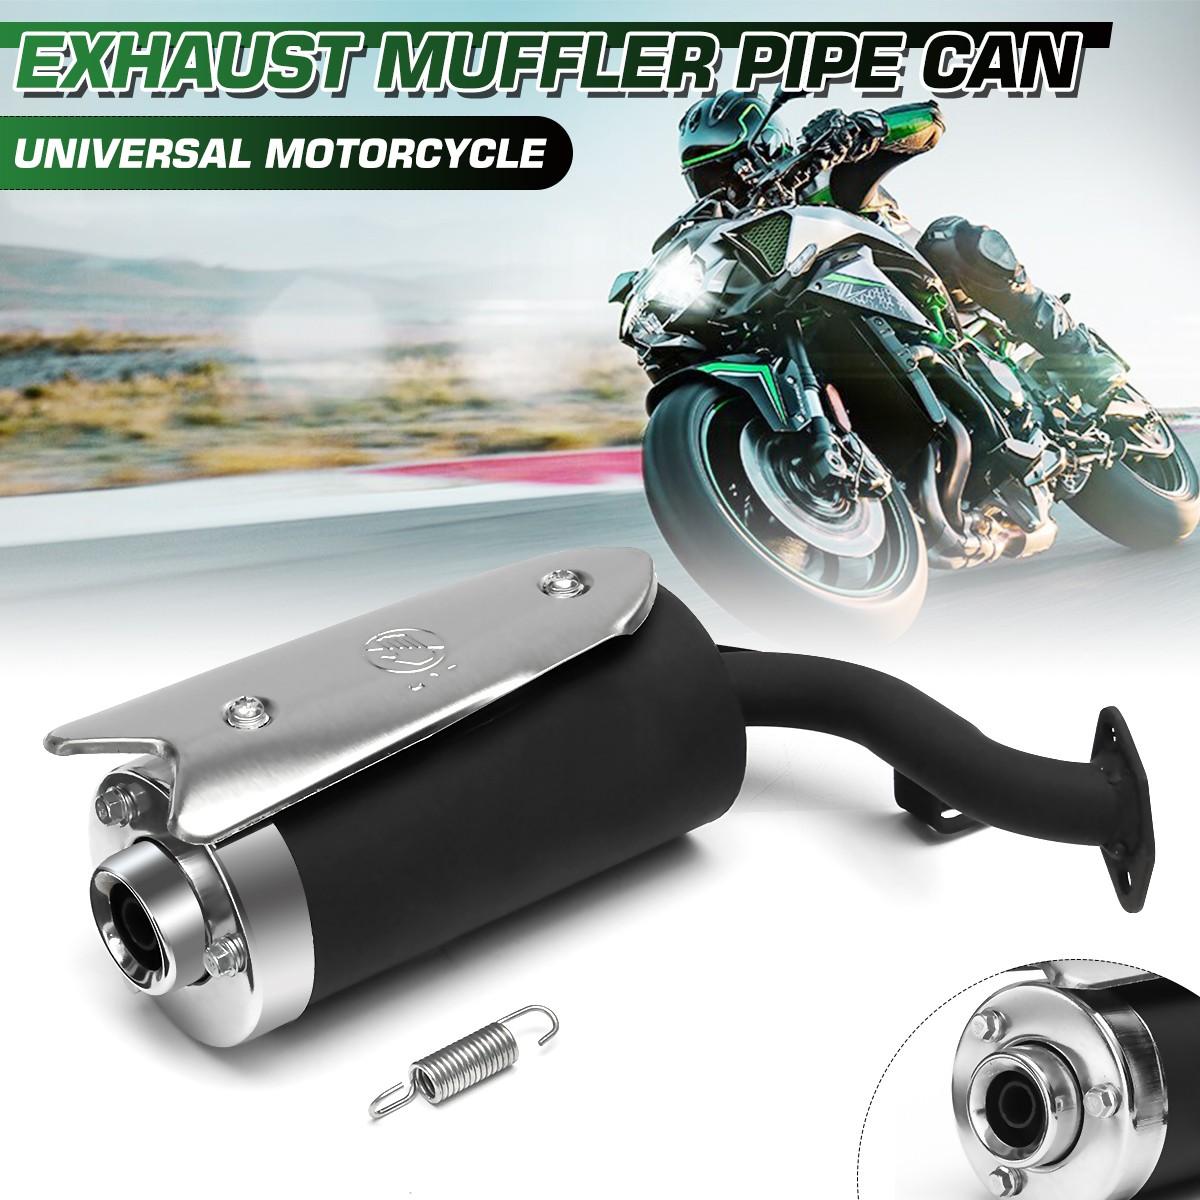 universal motorcycle exhaust muffler pipe can for mini bike